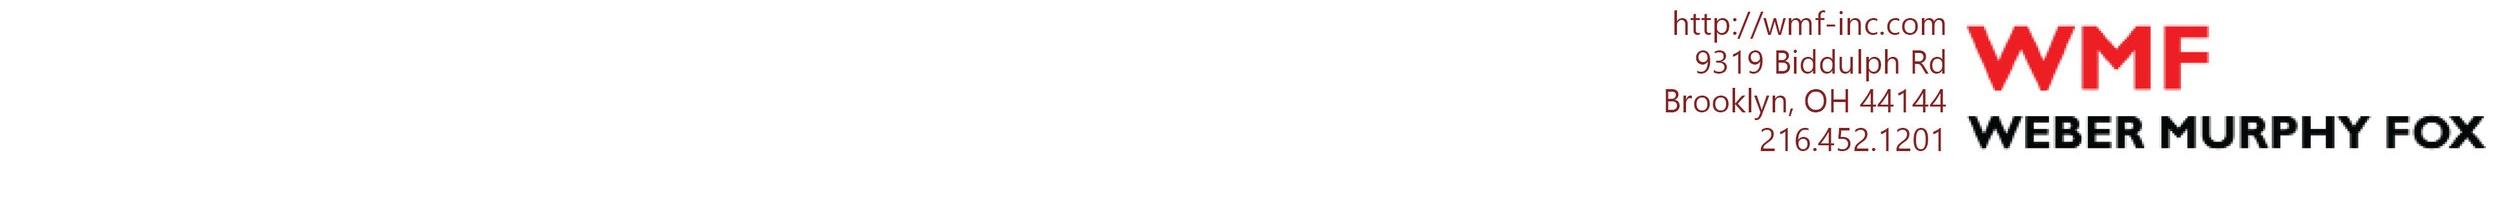 George Simpson banner.jpg